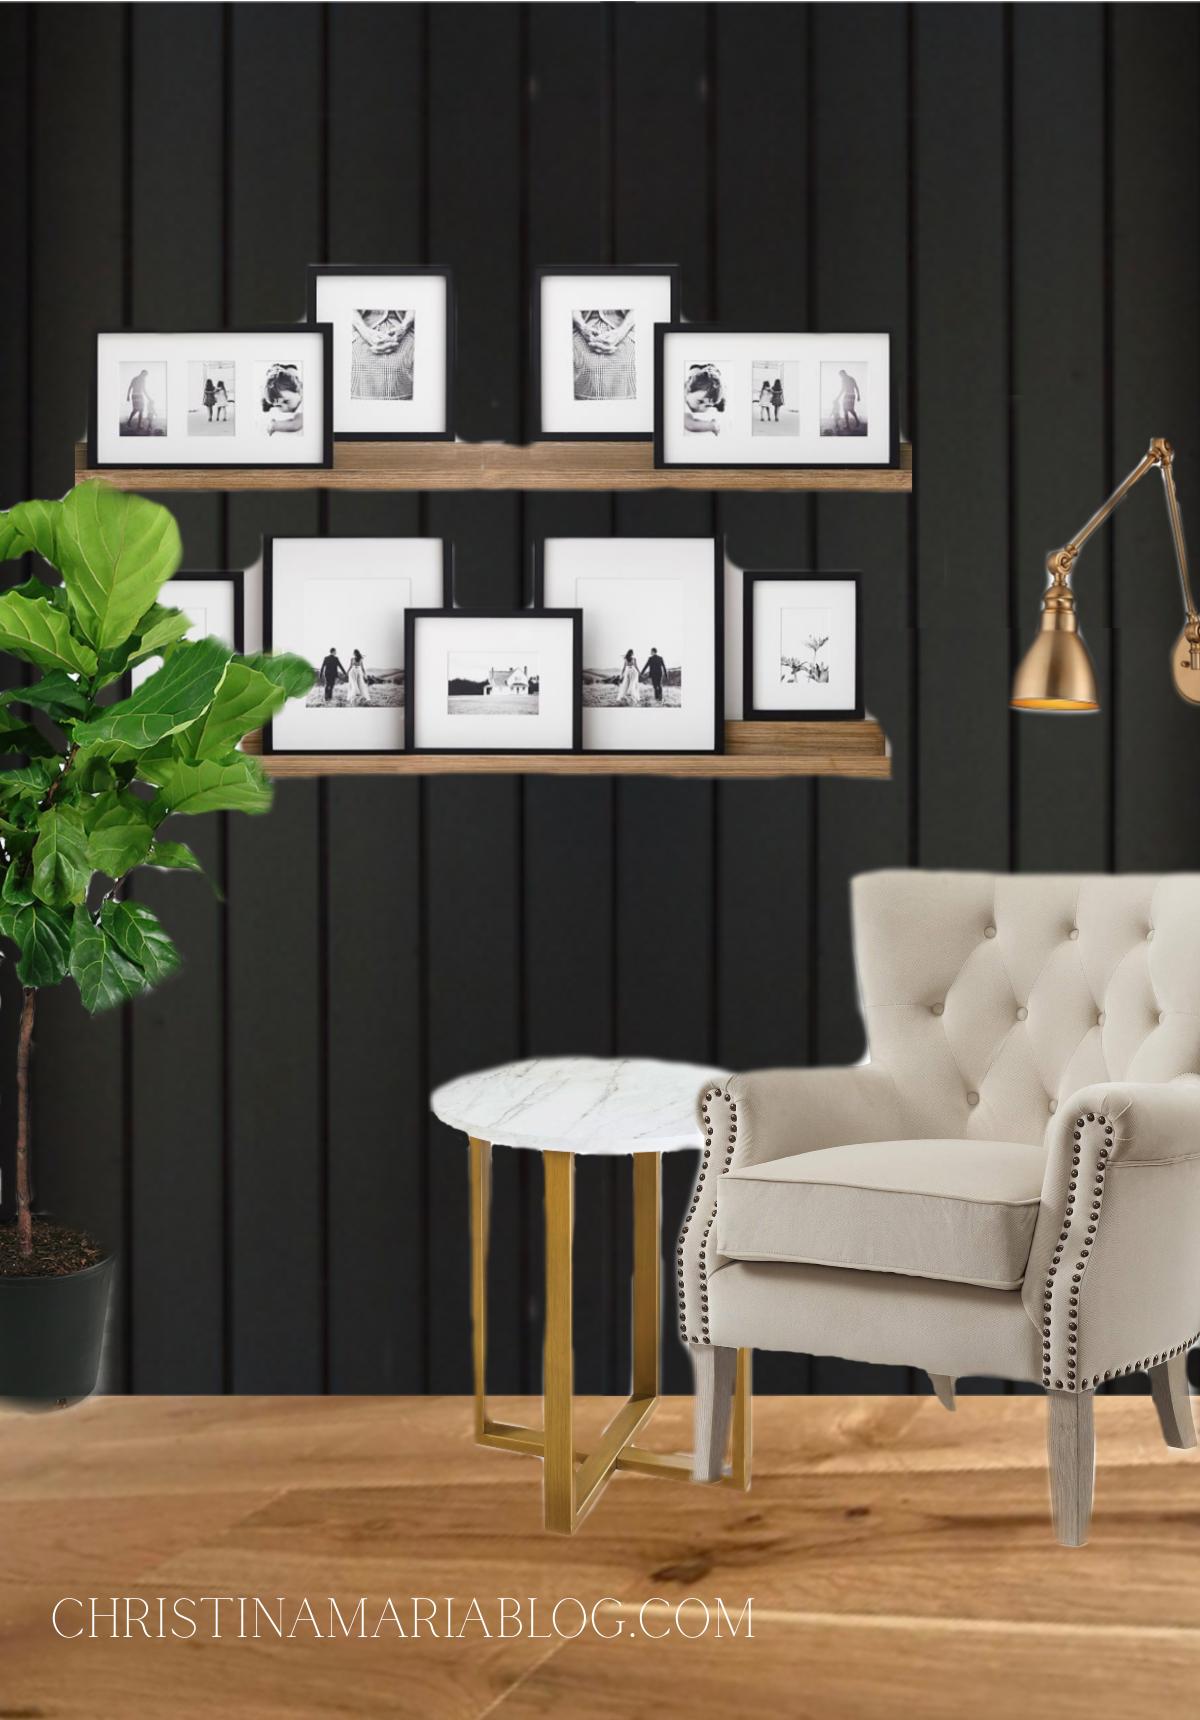 Family Room Design Plan & Mood Board